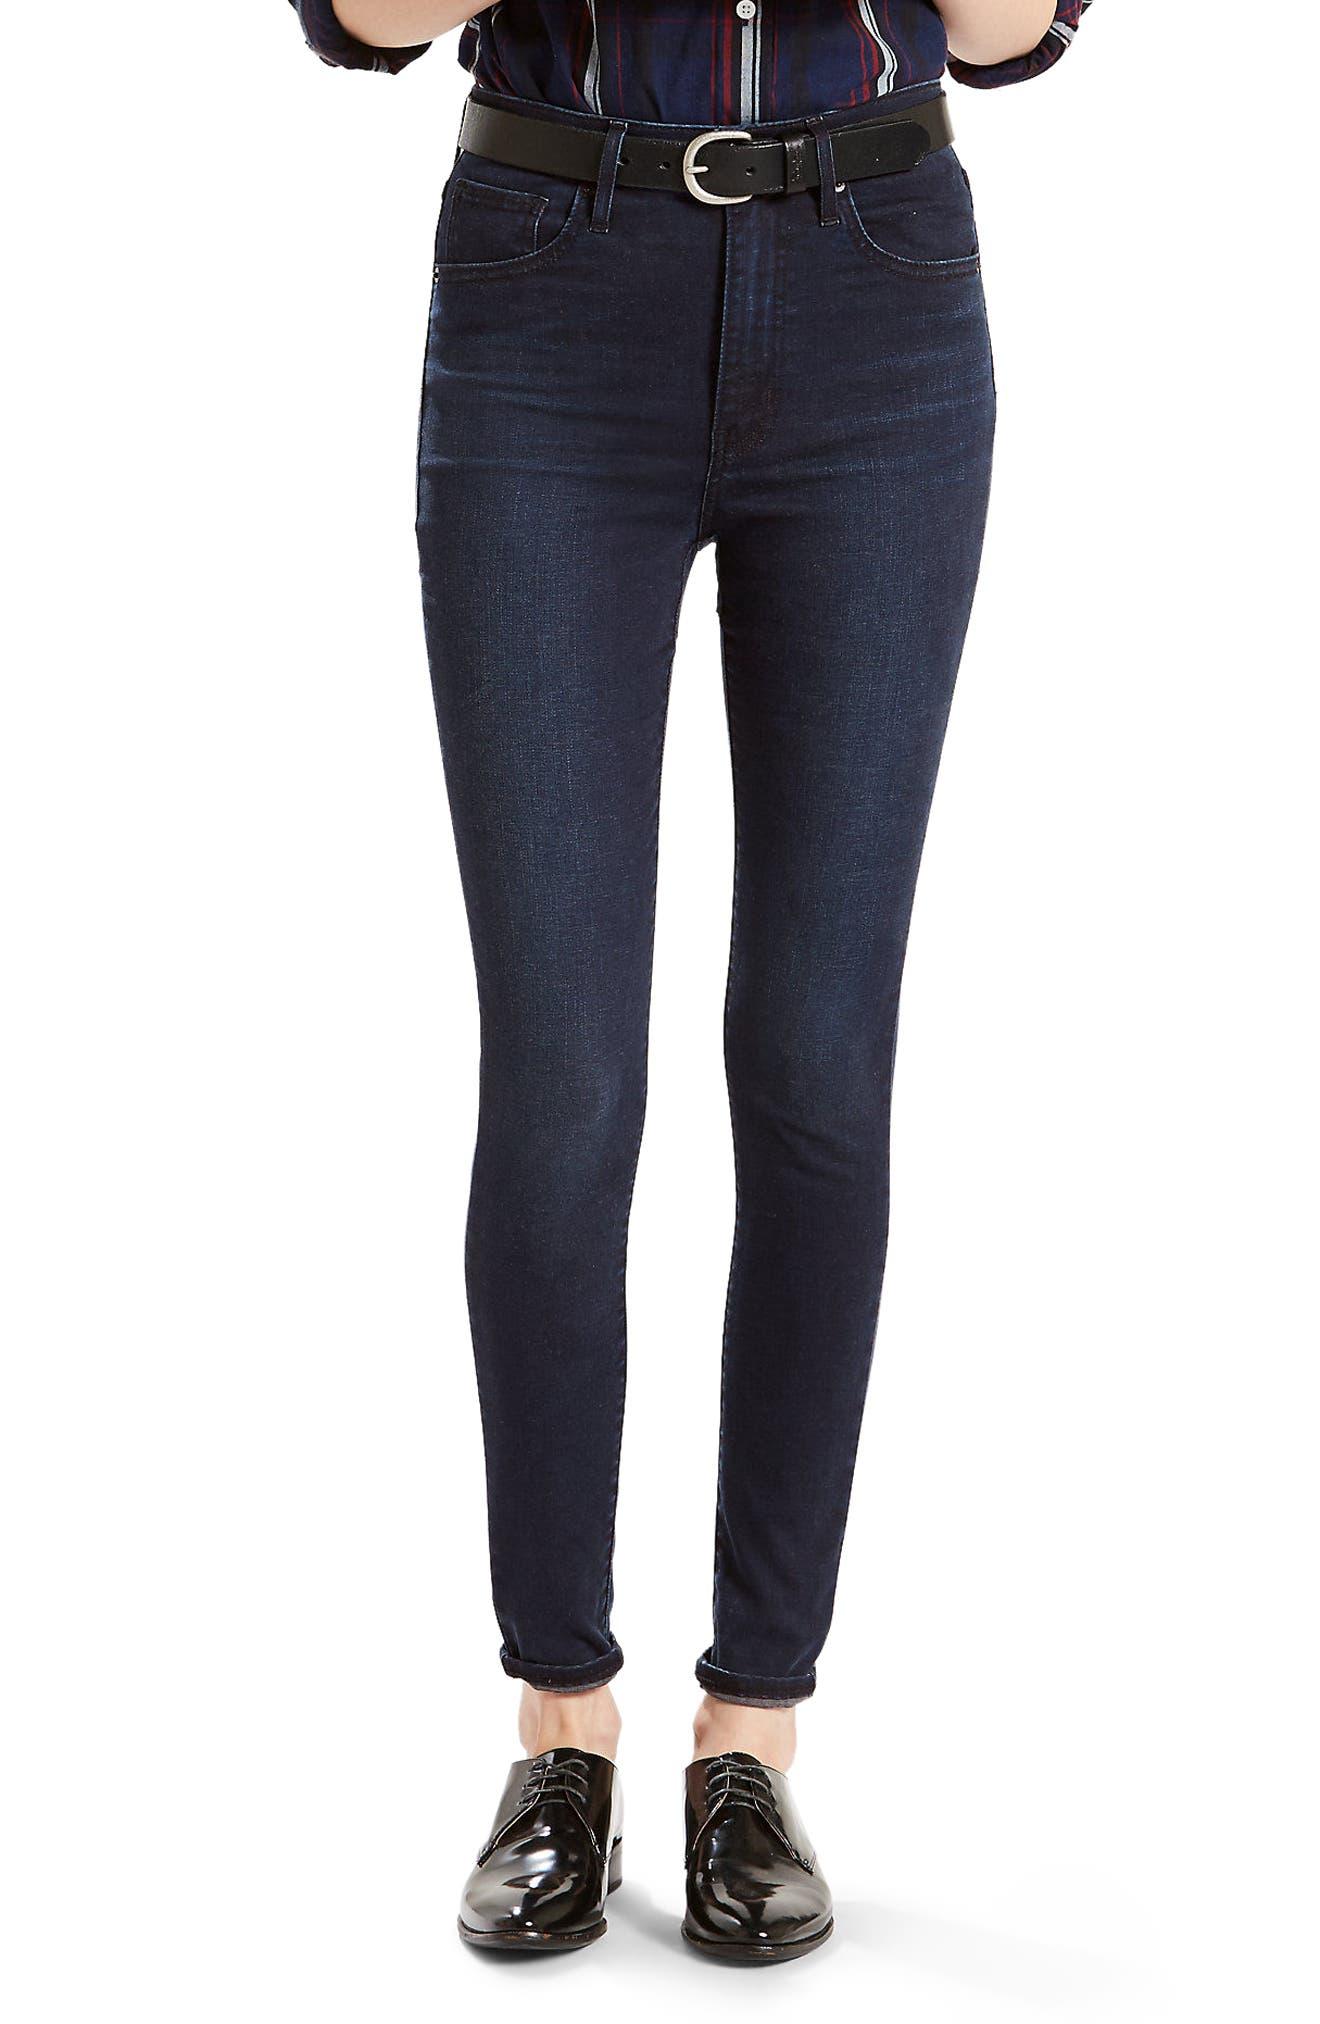 Main Image - Levi's® Mile High High Waist Super Skinny Jeans (Red Wonder)